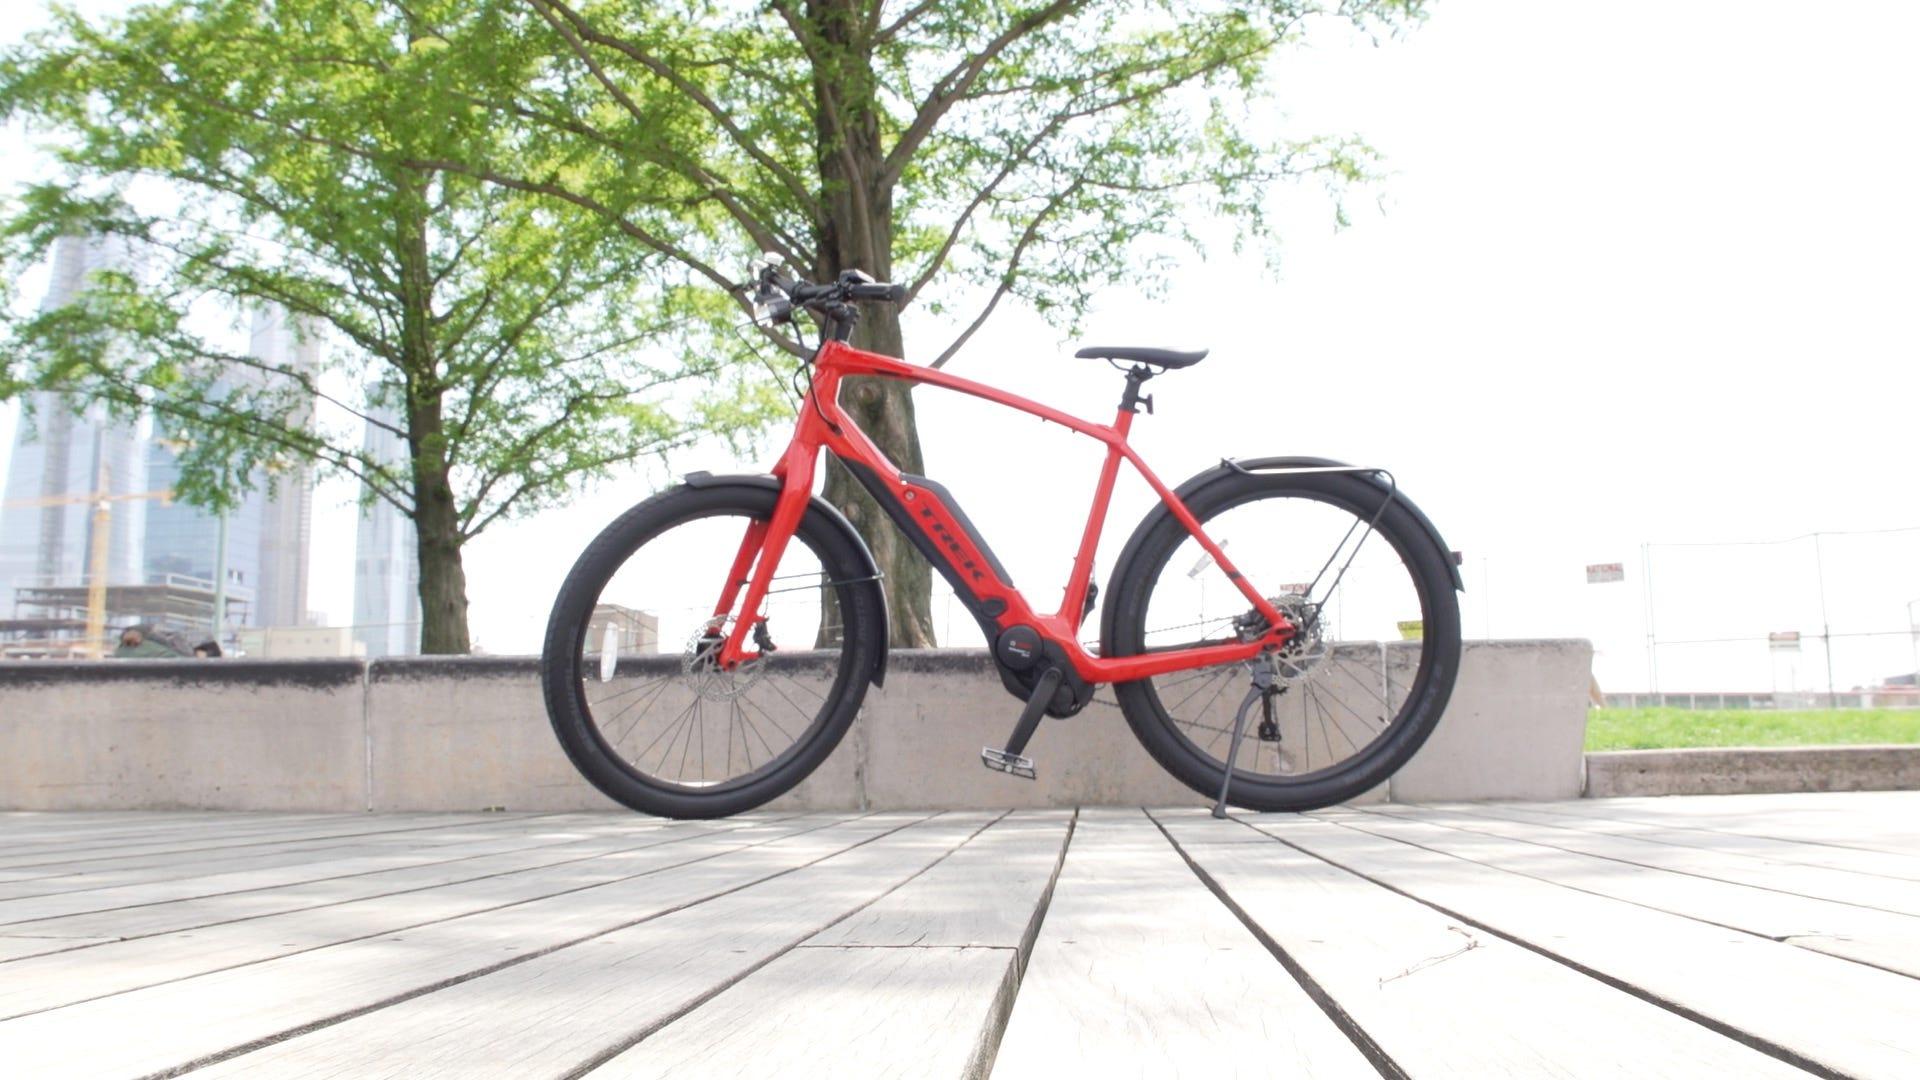 Trek's CEO John Burke talks e-bikes and the benefits of cycling